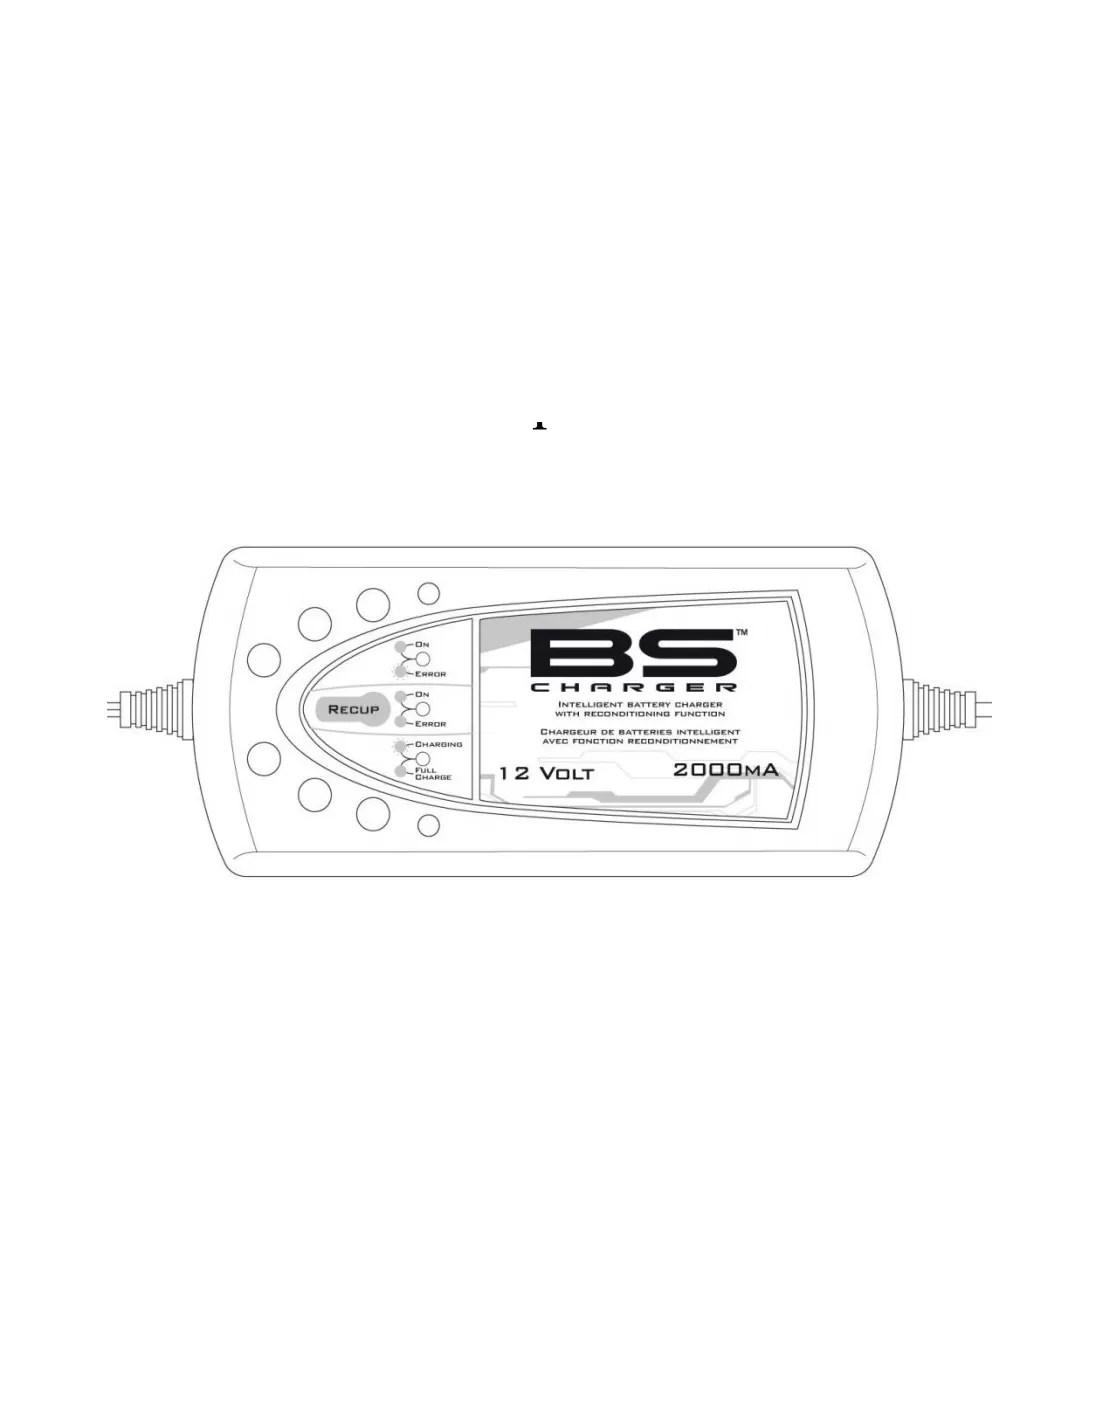 Charger Ba20 5 Fokozatu Toltes Es Karbantartas Toltes